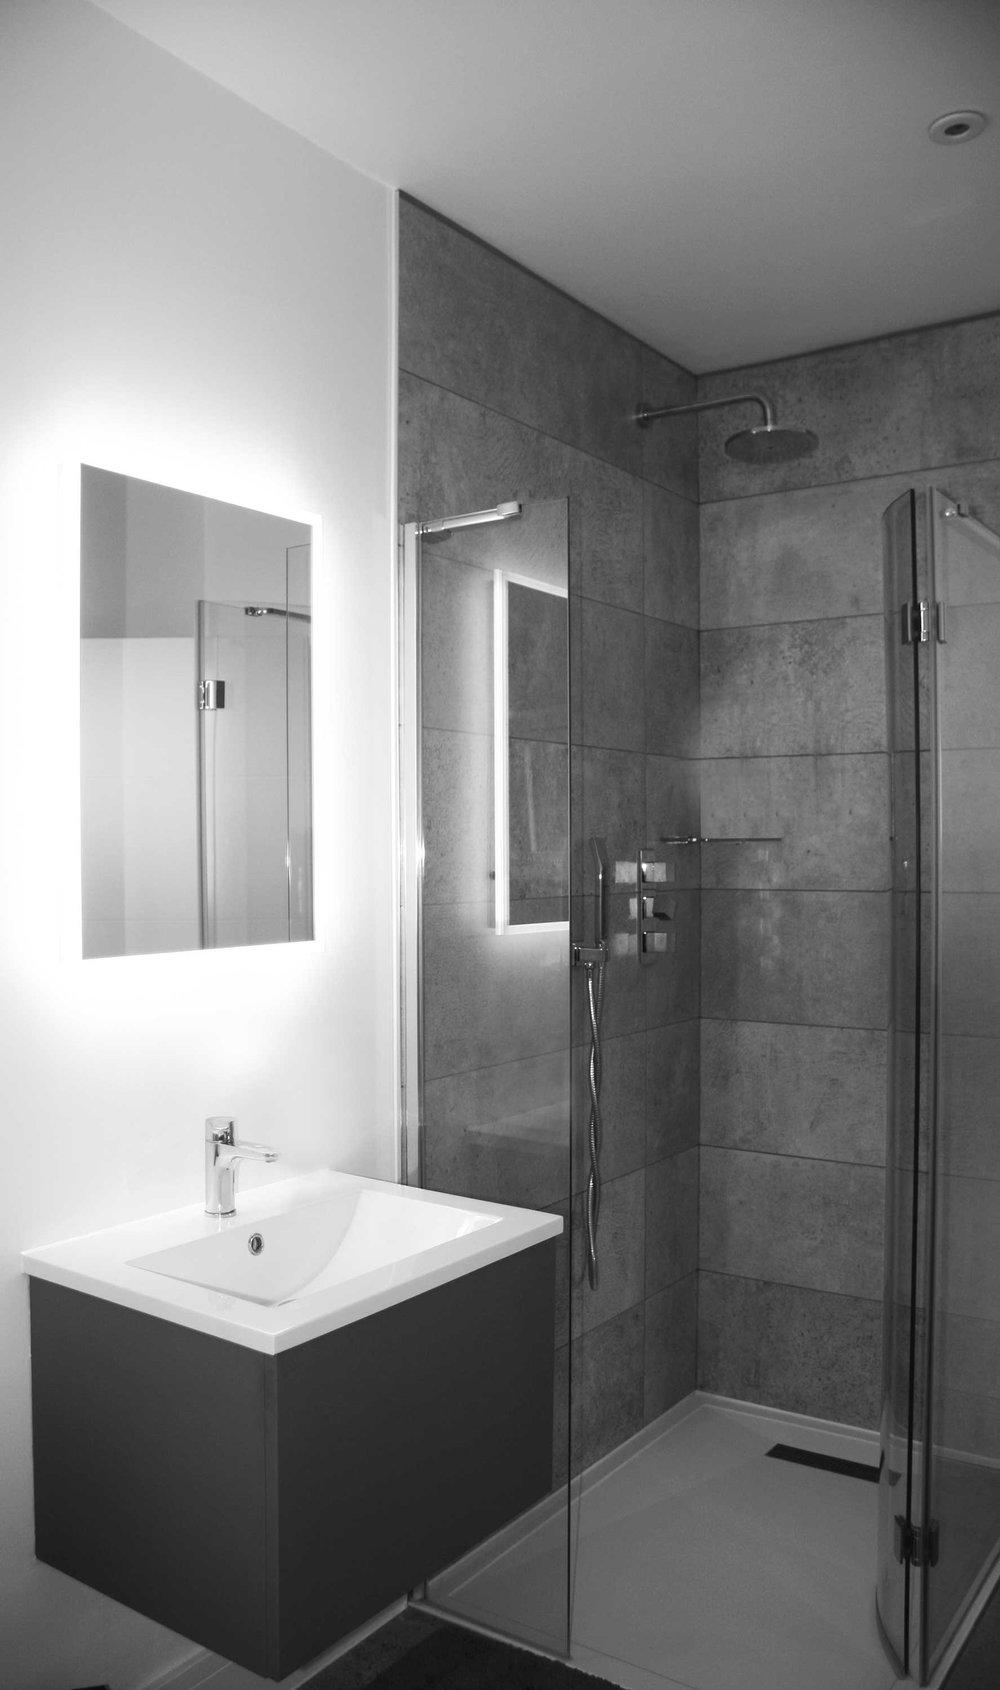 EVN-Eleven-Acre-Rise-Shower-Room-Craeft-Architects-BW.jpg